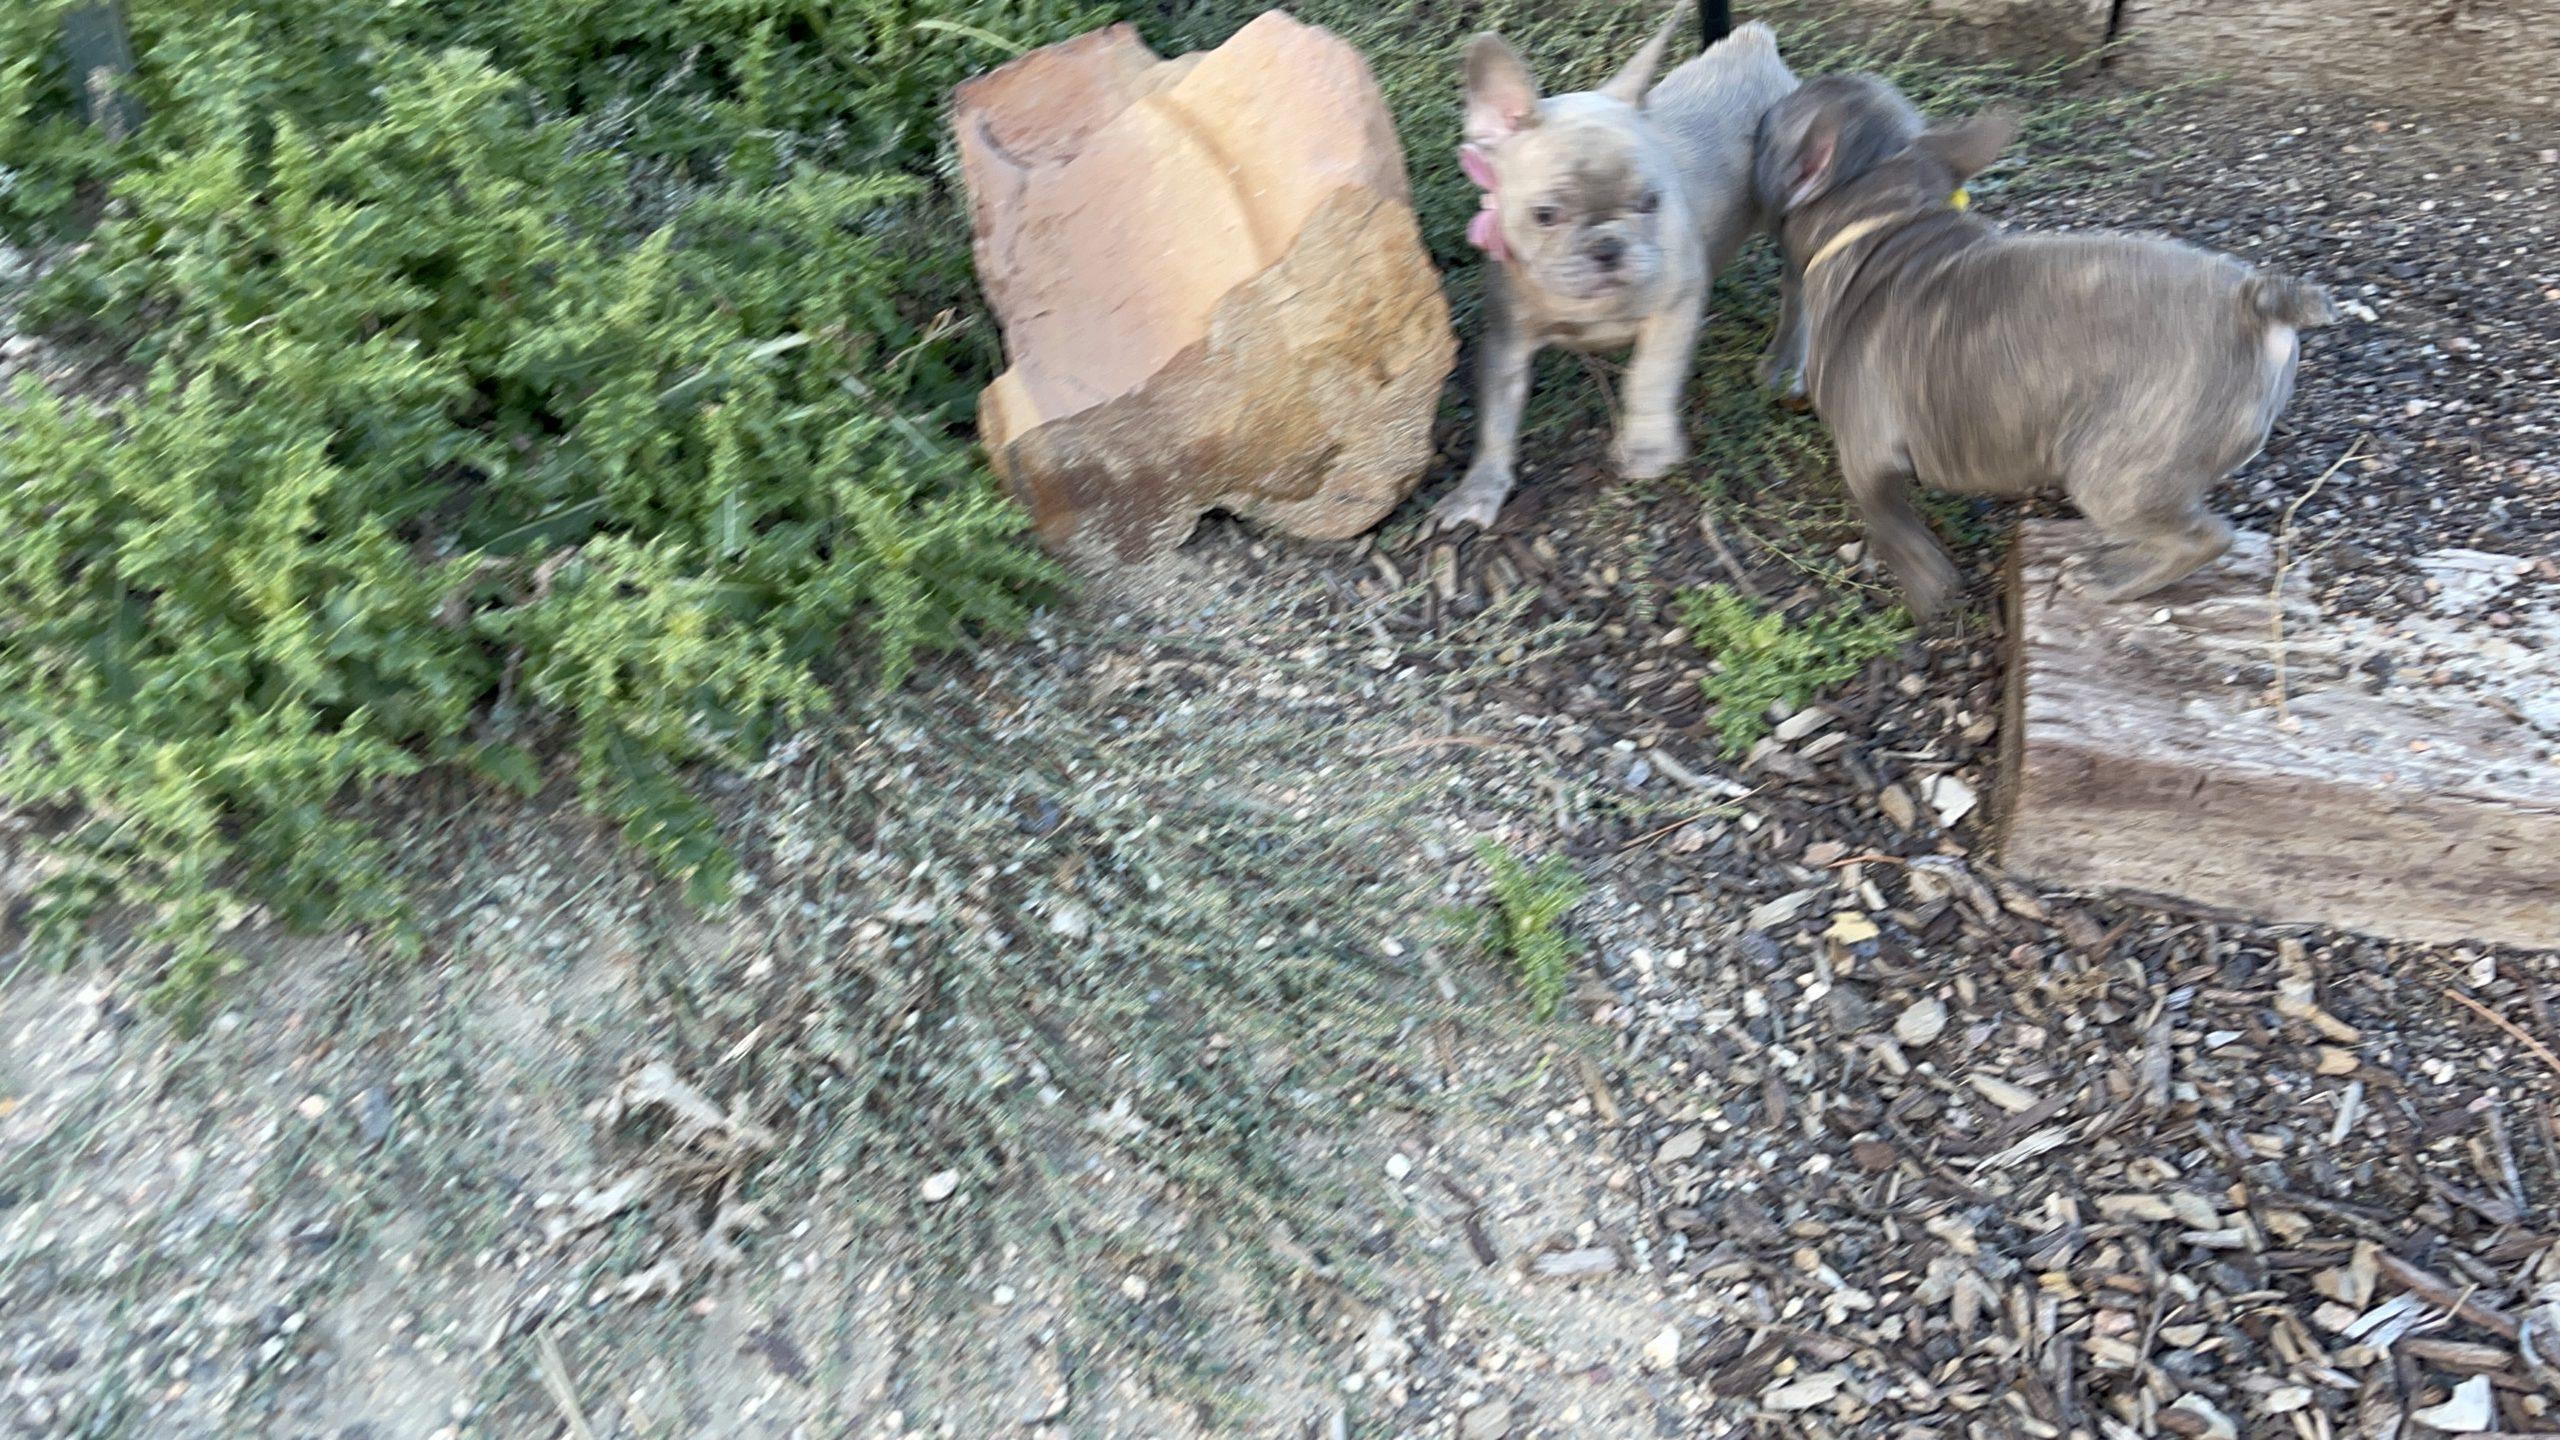 Lilac Fawn Male French Bulldog: Hoagie